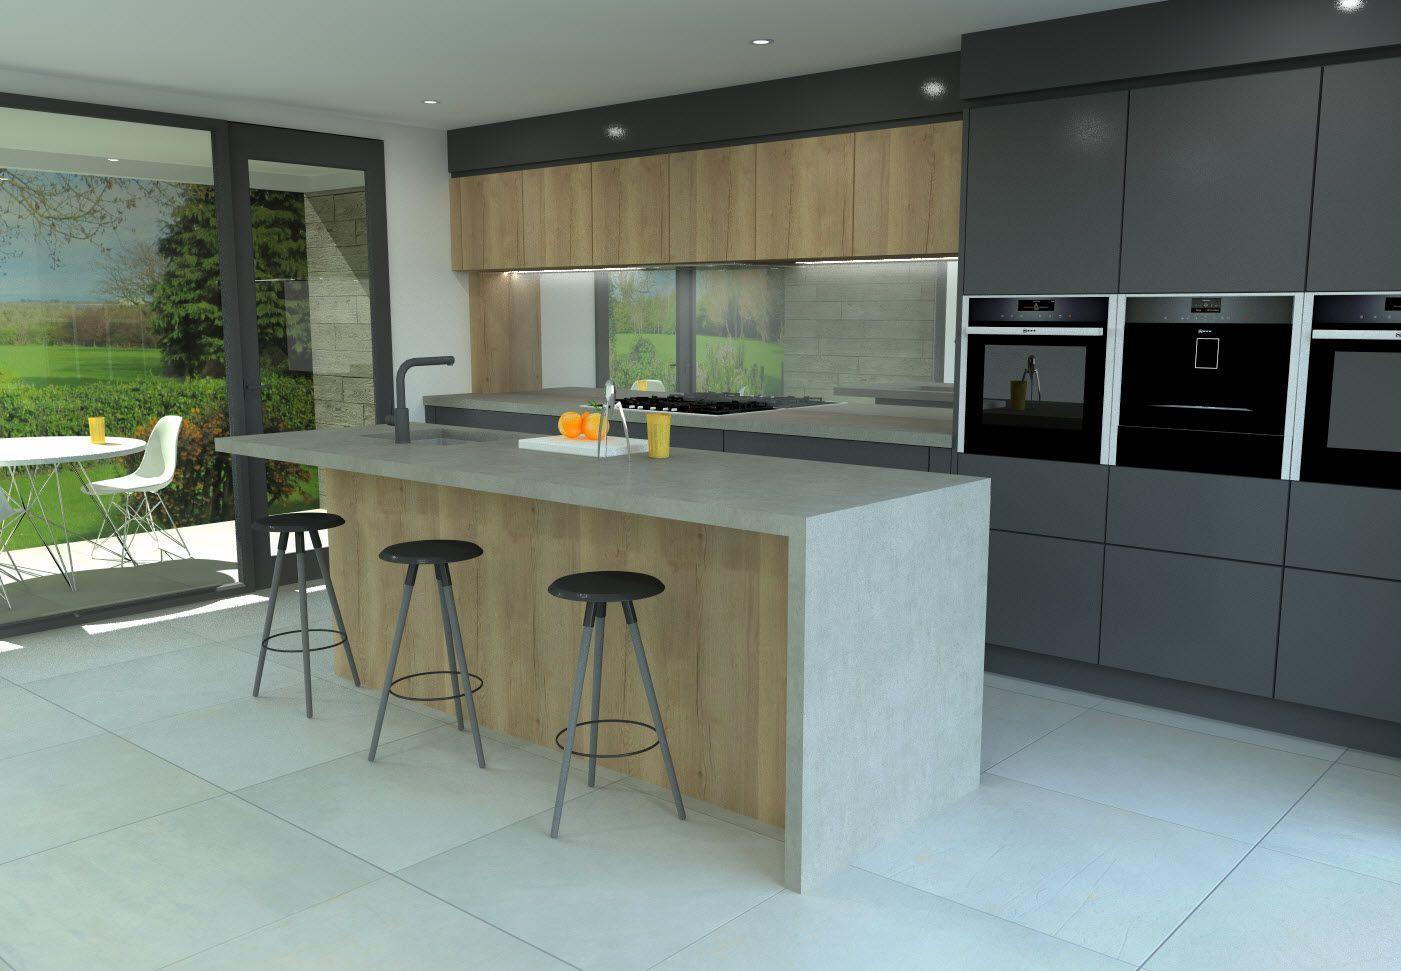 Exceptional Saffron Interiors   Fusion Kitchen True Handle Less (tip On) Doors.